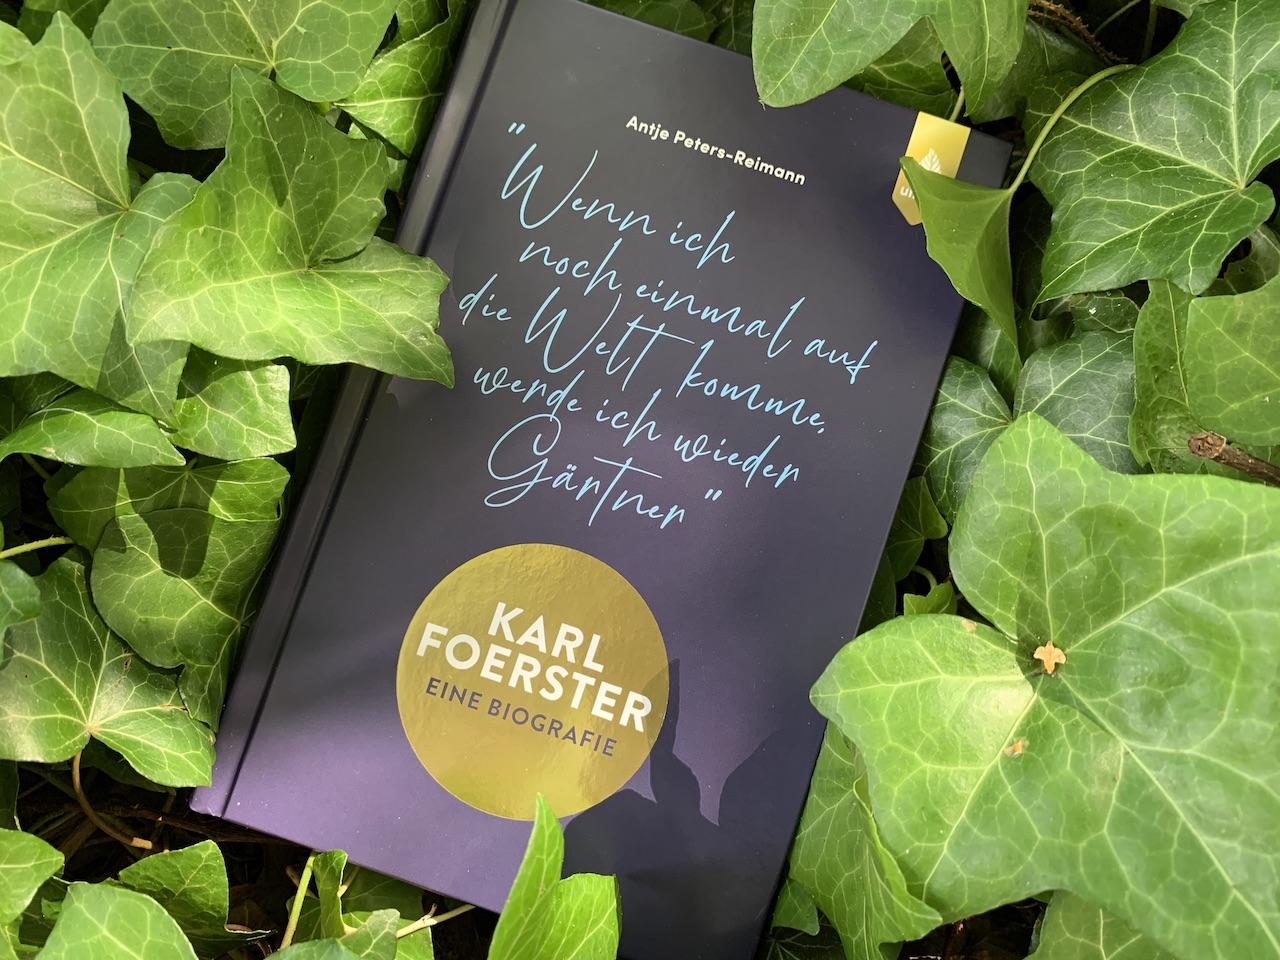 Karl Foerster, Biografie